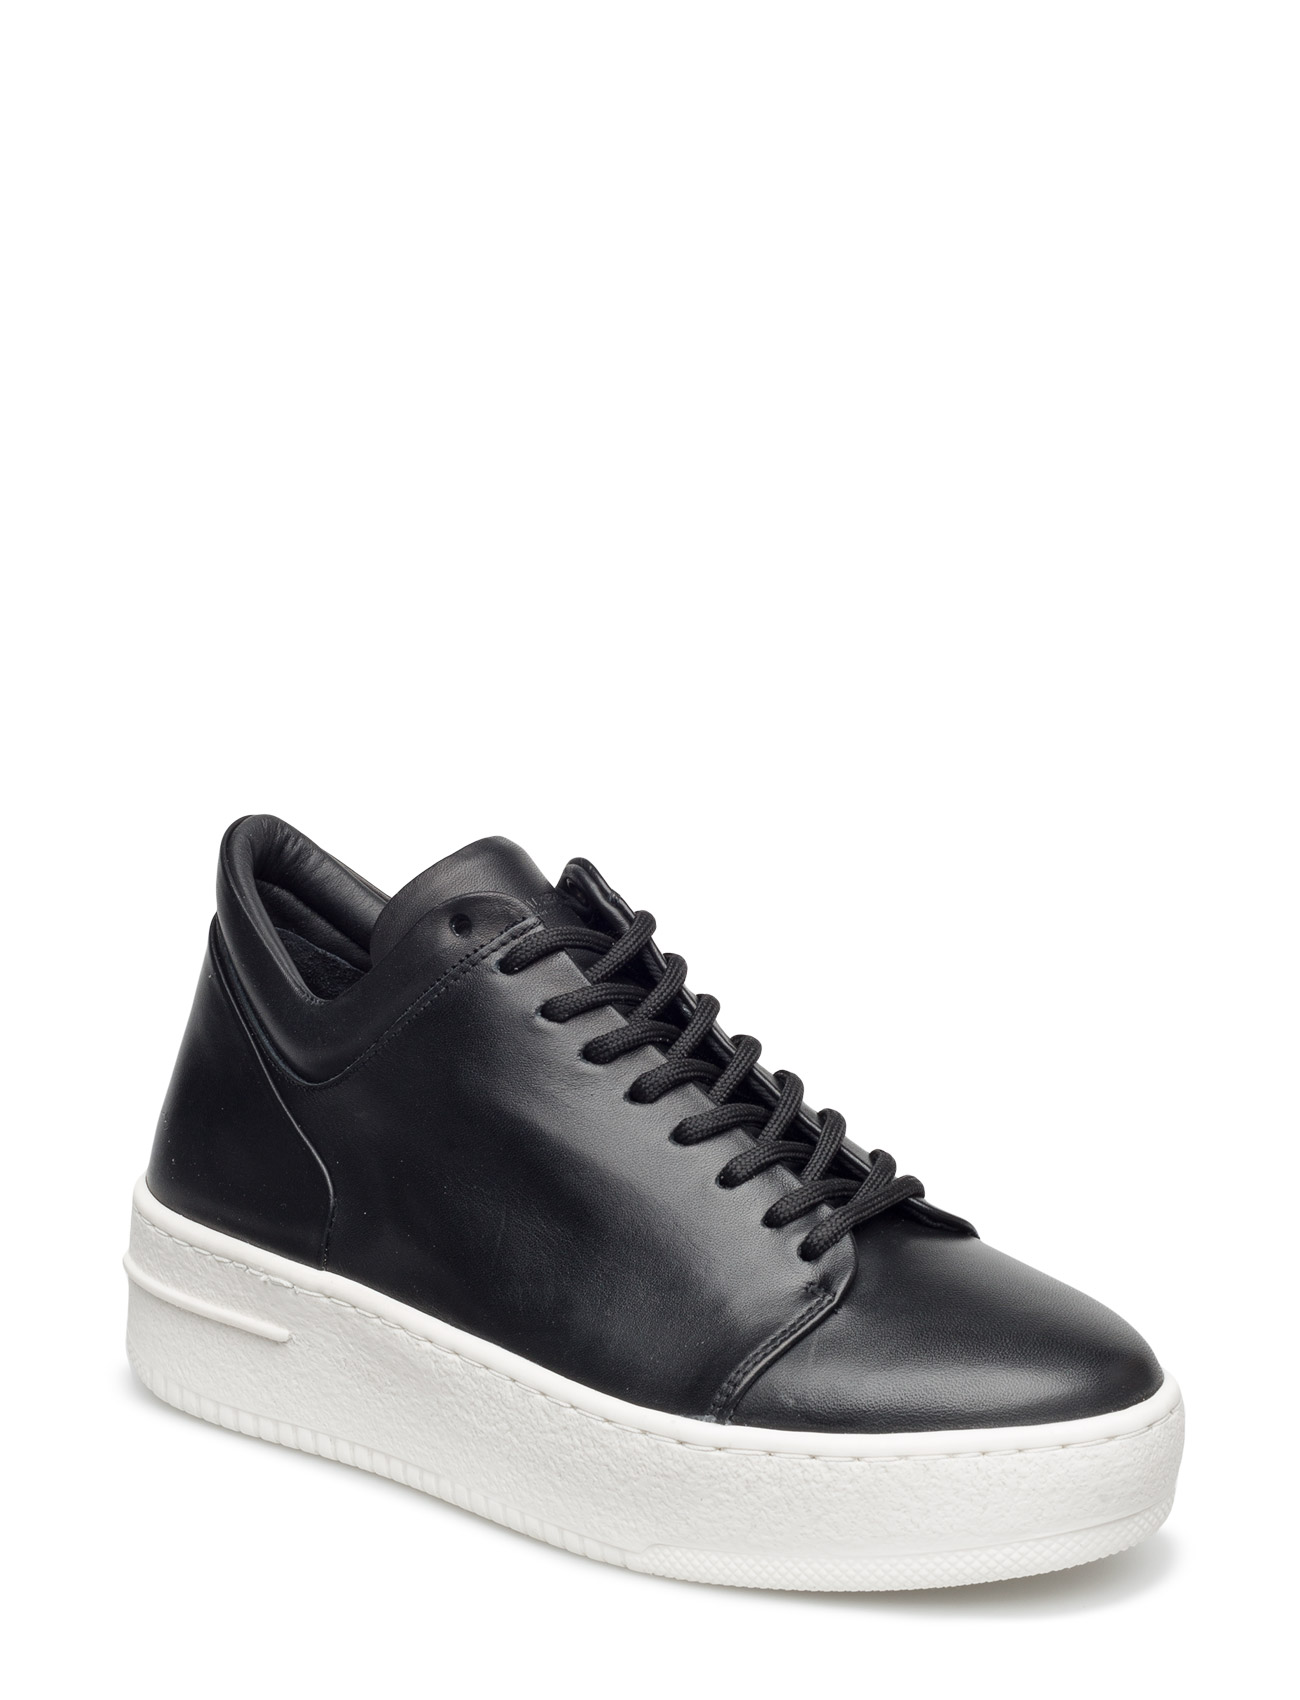 Seven20 Hi Shoe Royal RepubliQ Sneakers til Kvinder i Sort